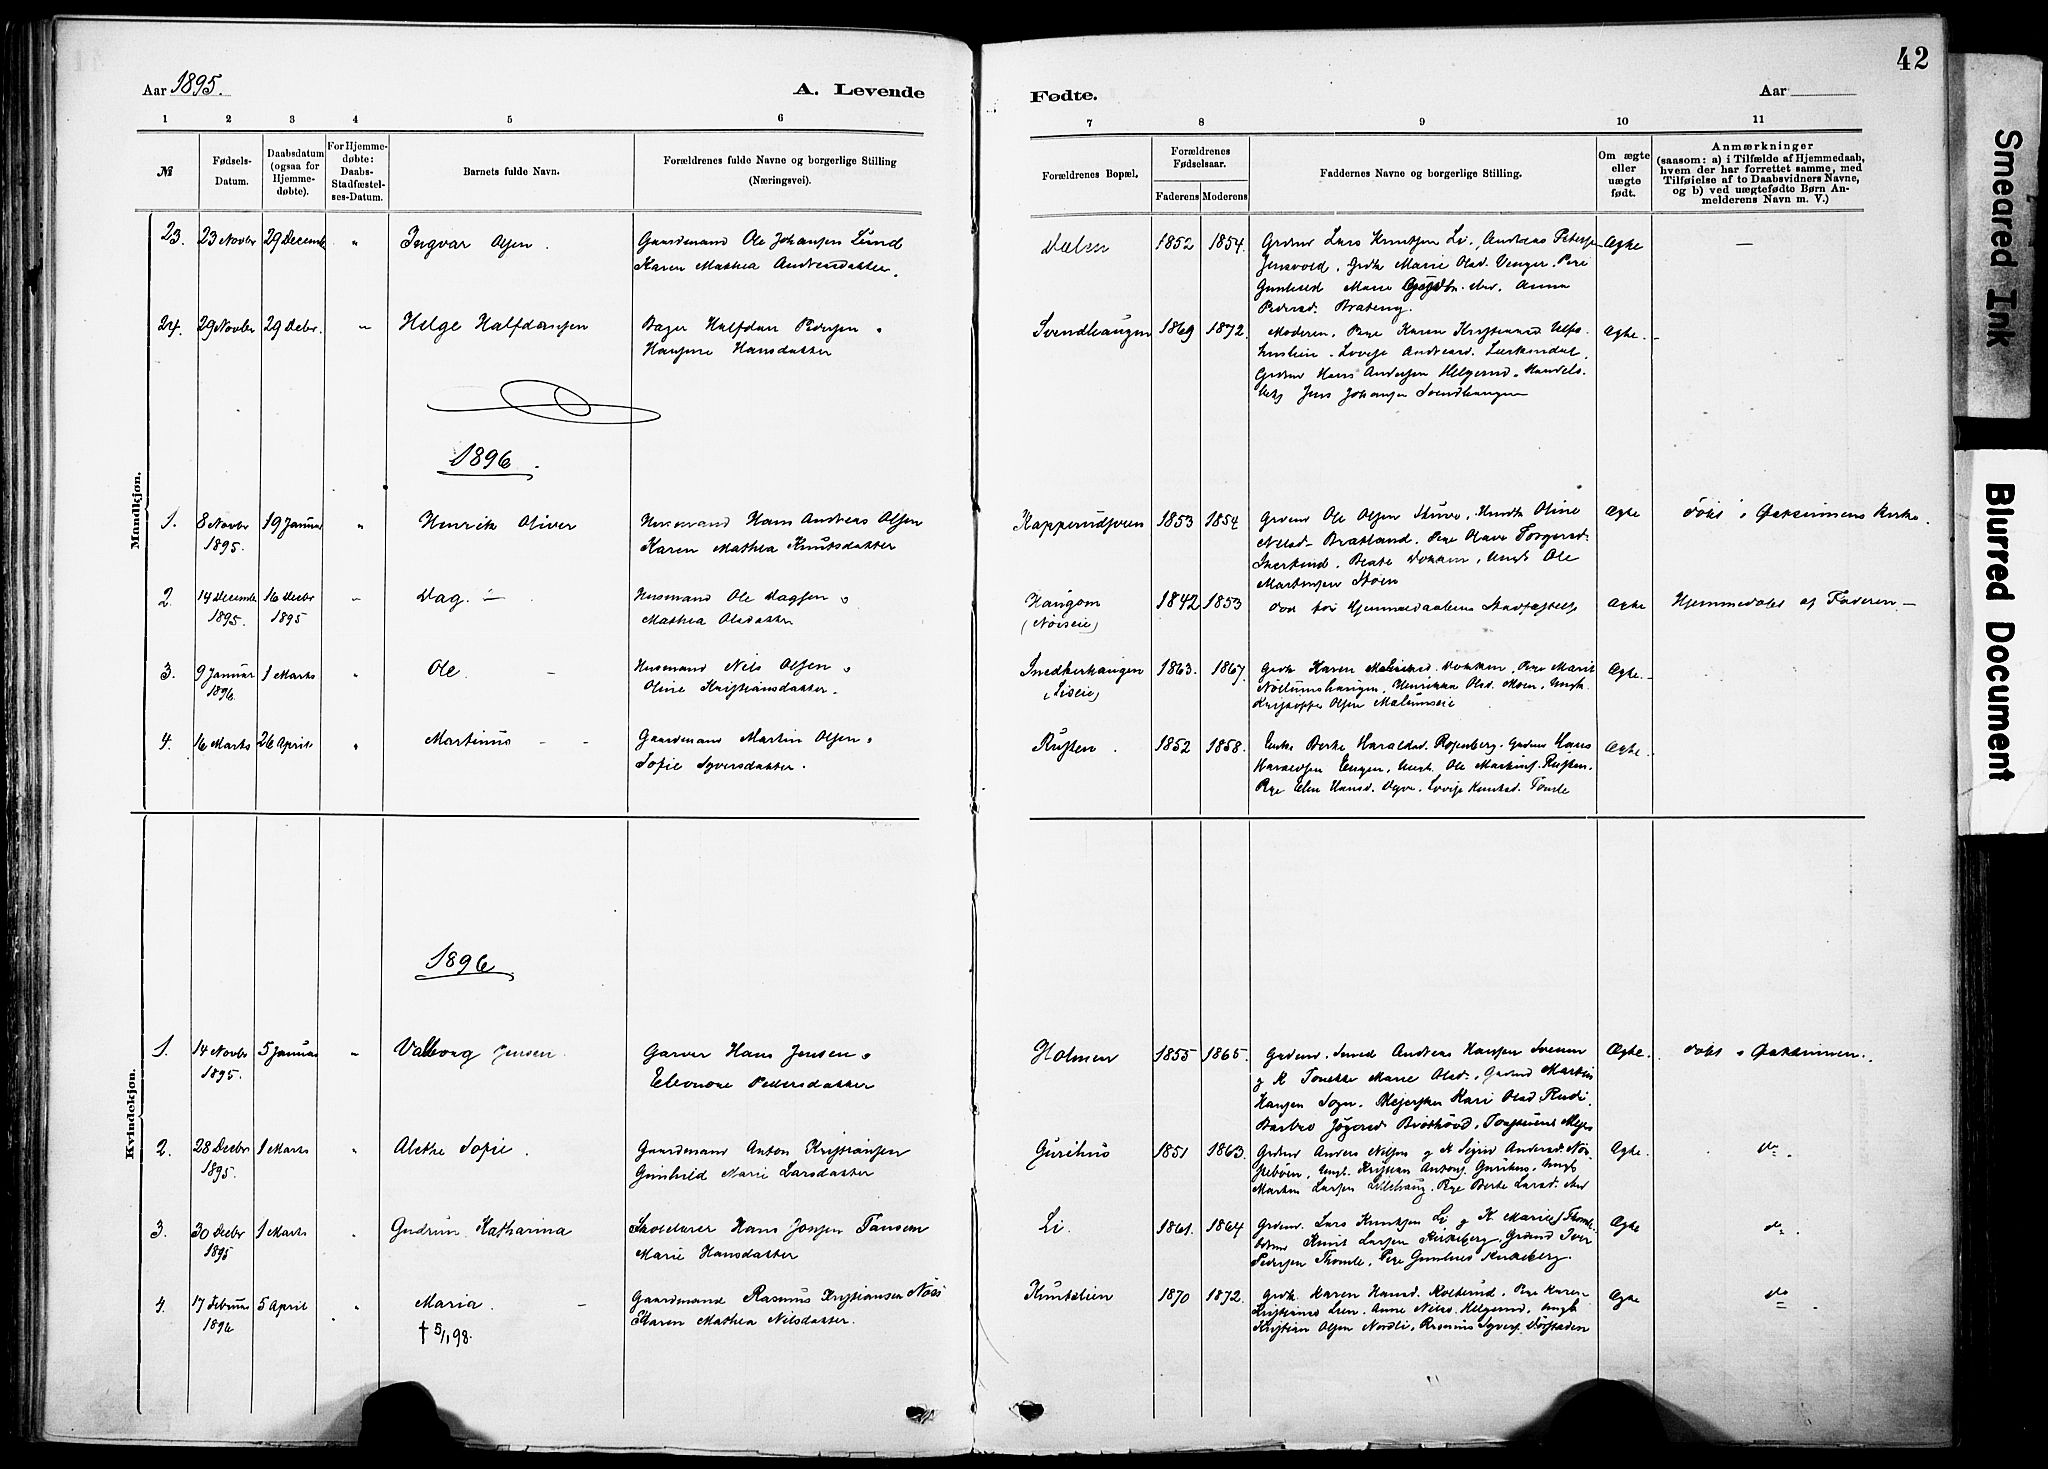 SAH, Nordre Land prestekontor, Ministerialbok nr. 5, 1882-1903, s. 42